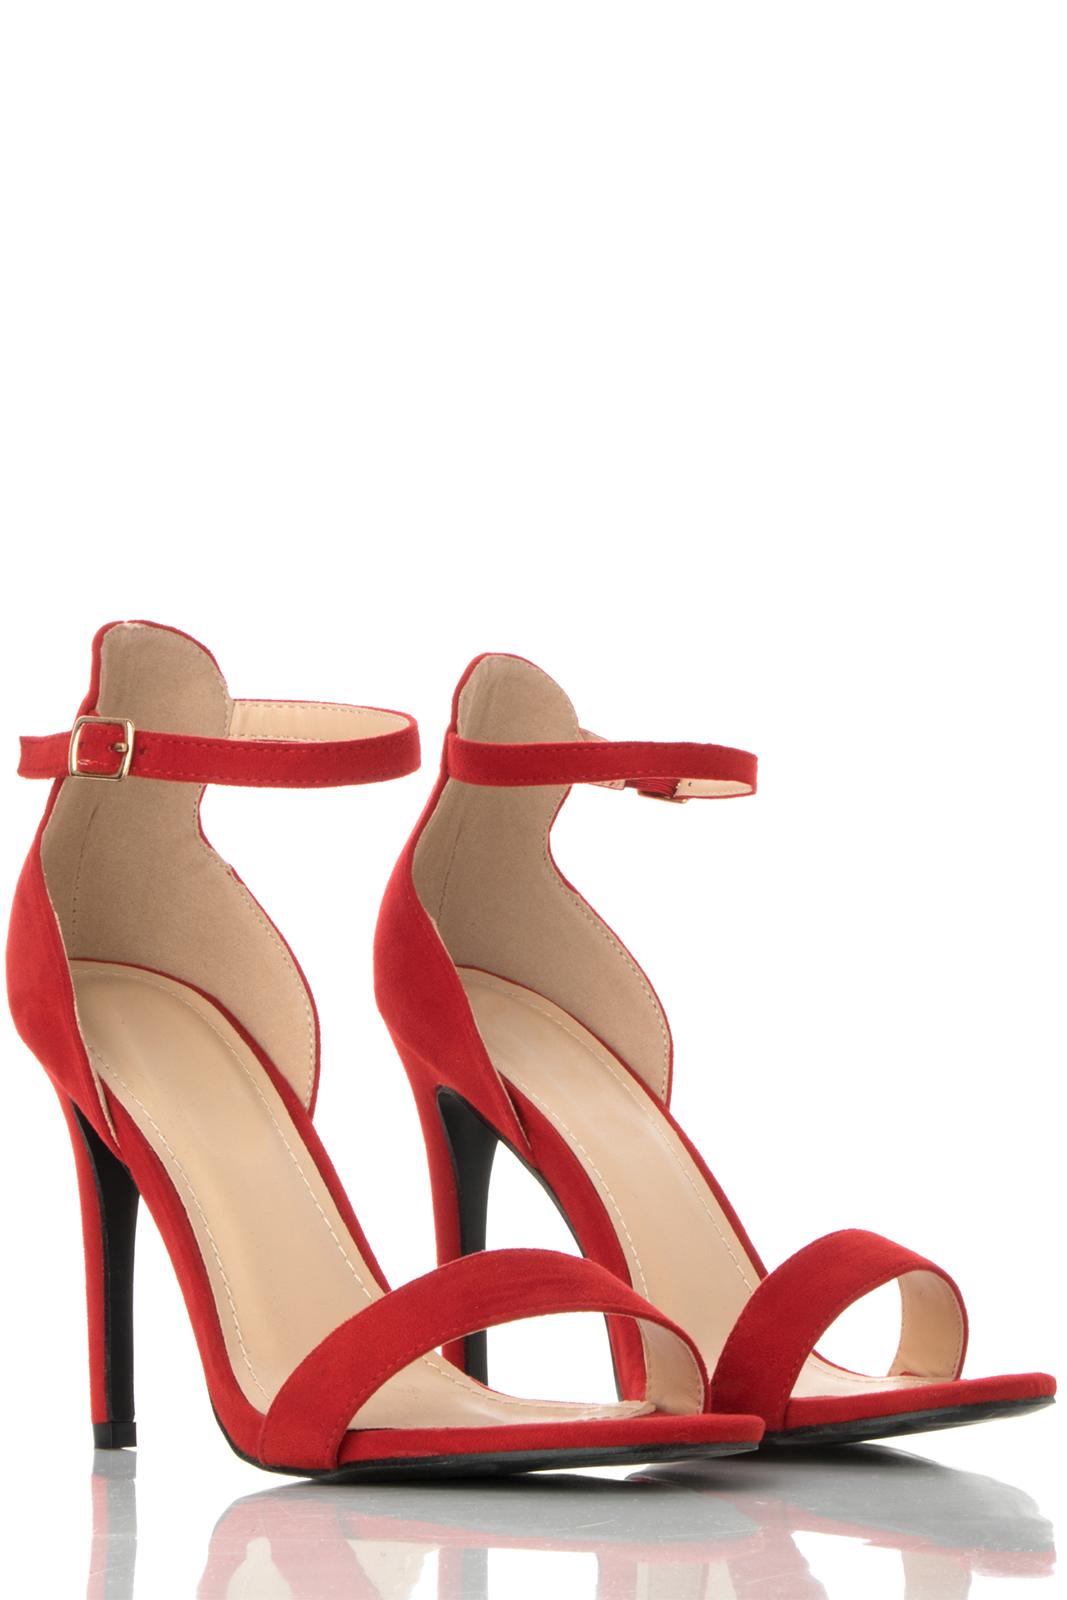 321e12f403f online αγορές 1 γυναικεία παπούτσια γόβες πέδιλα ψηλά